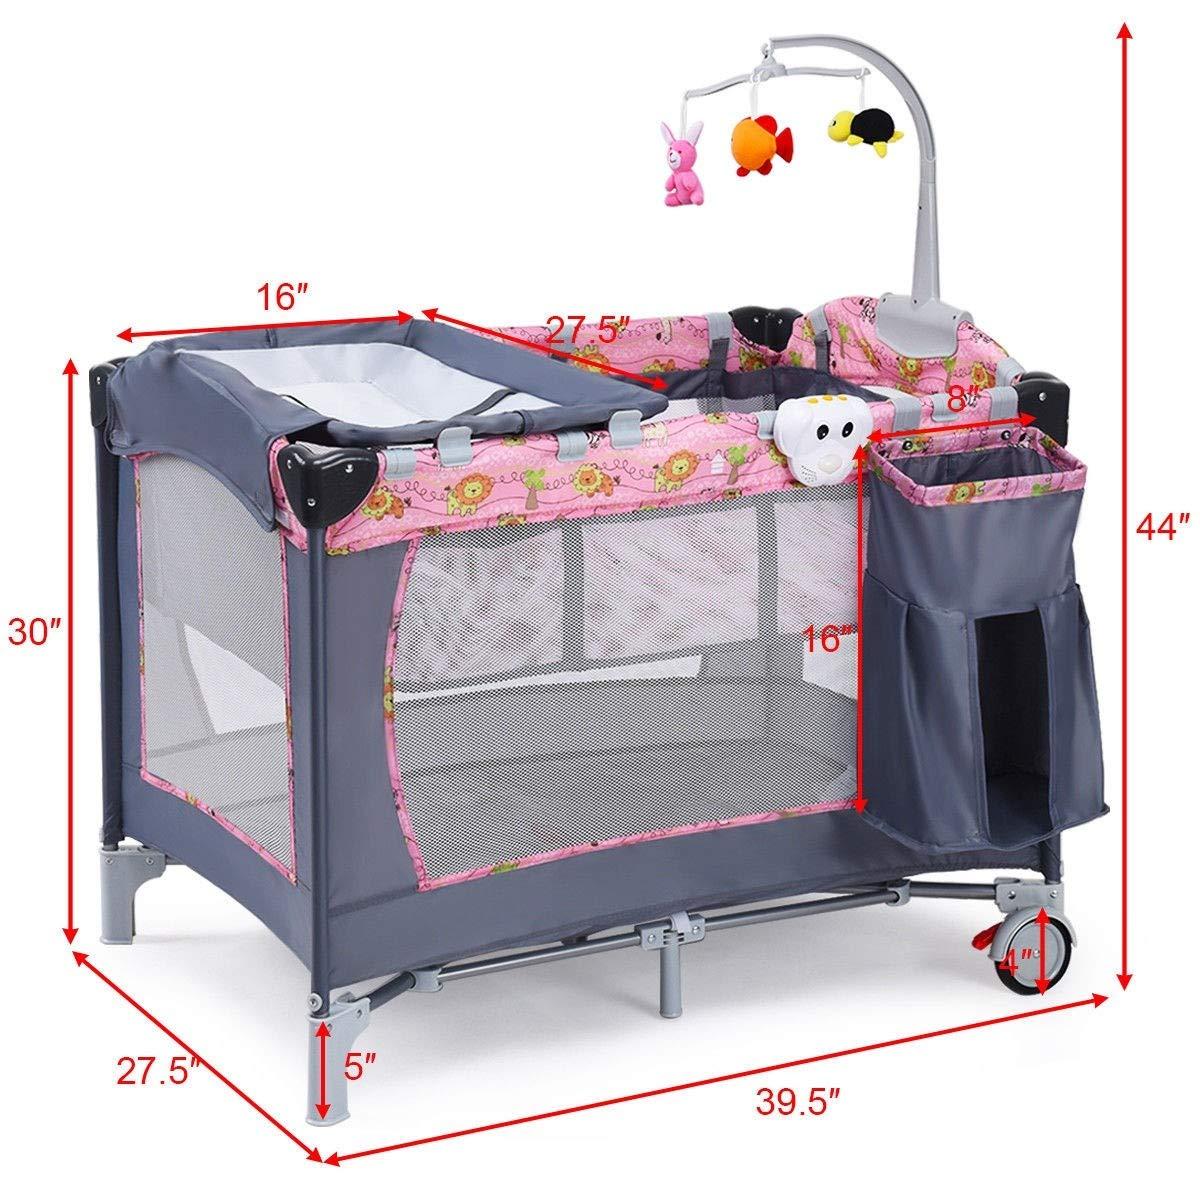 Baby Trend Nursery Playard Pack-N-Play Portable Bassinet Napper Crib Free Ship